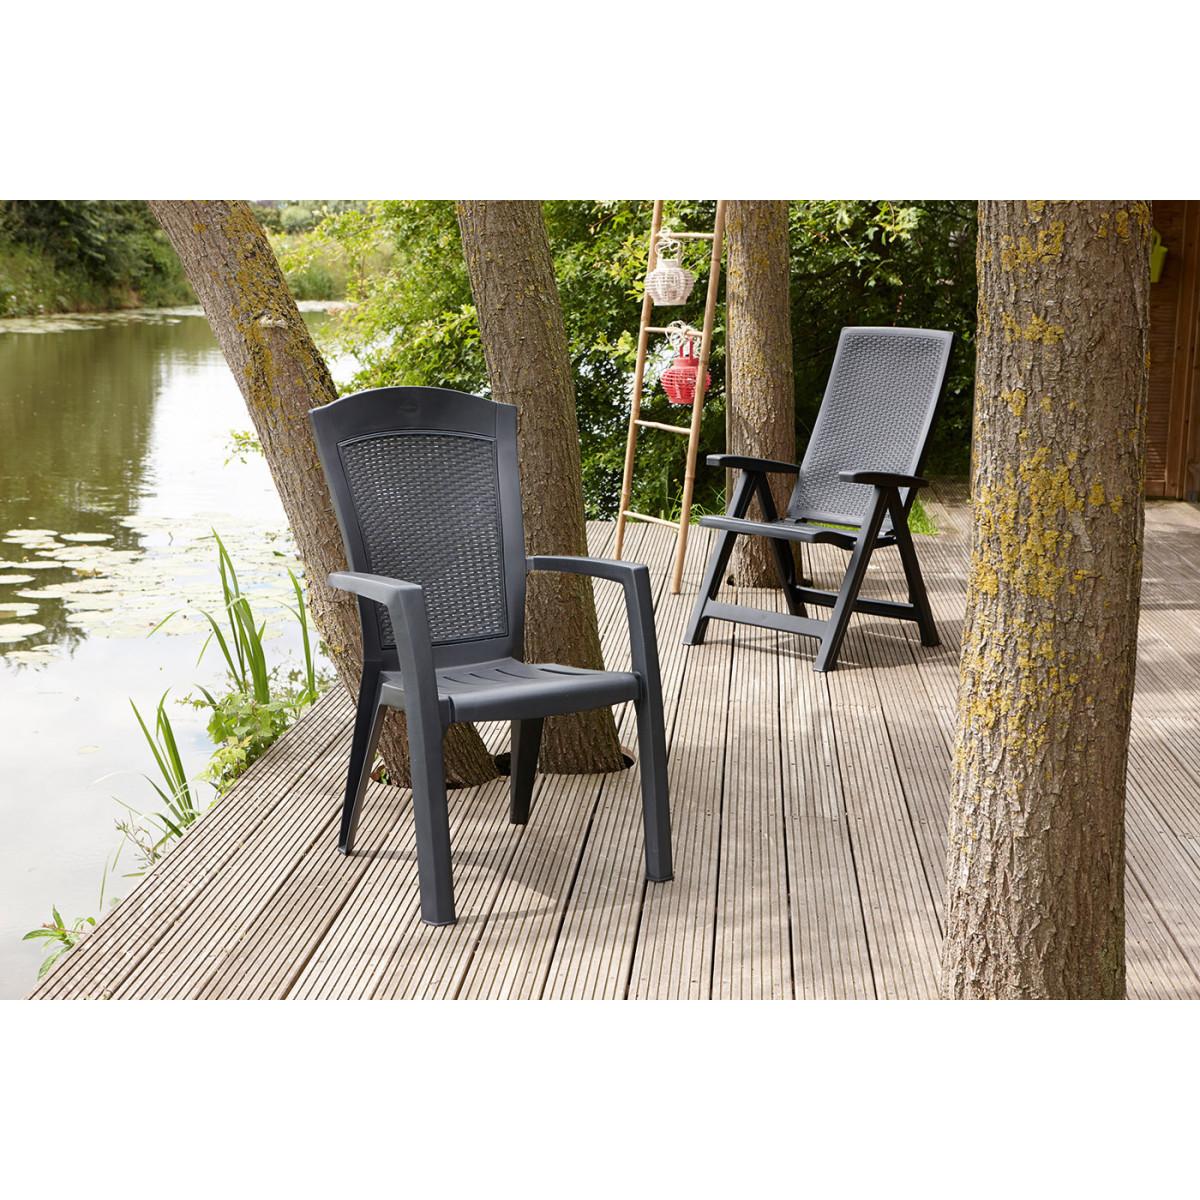 Кресло Садовое Keter Minnesota 65Х65Х99 Пластик Коричневый